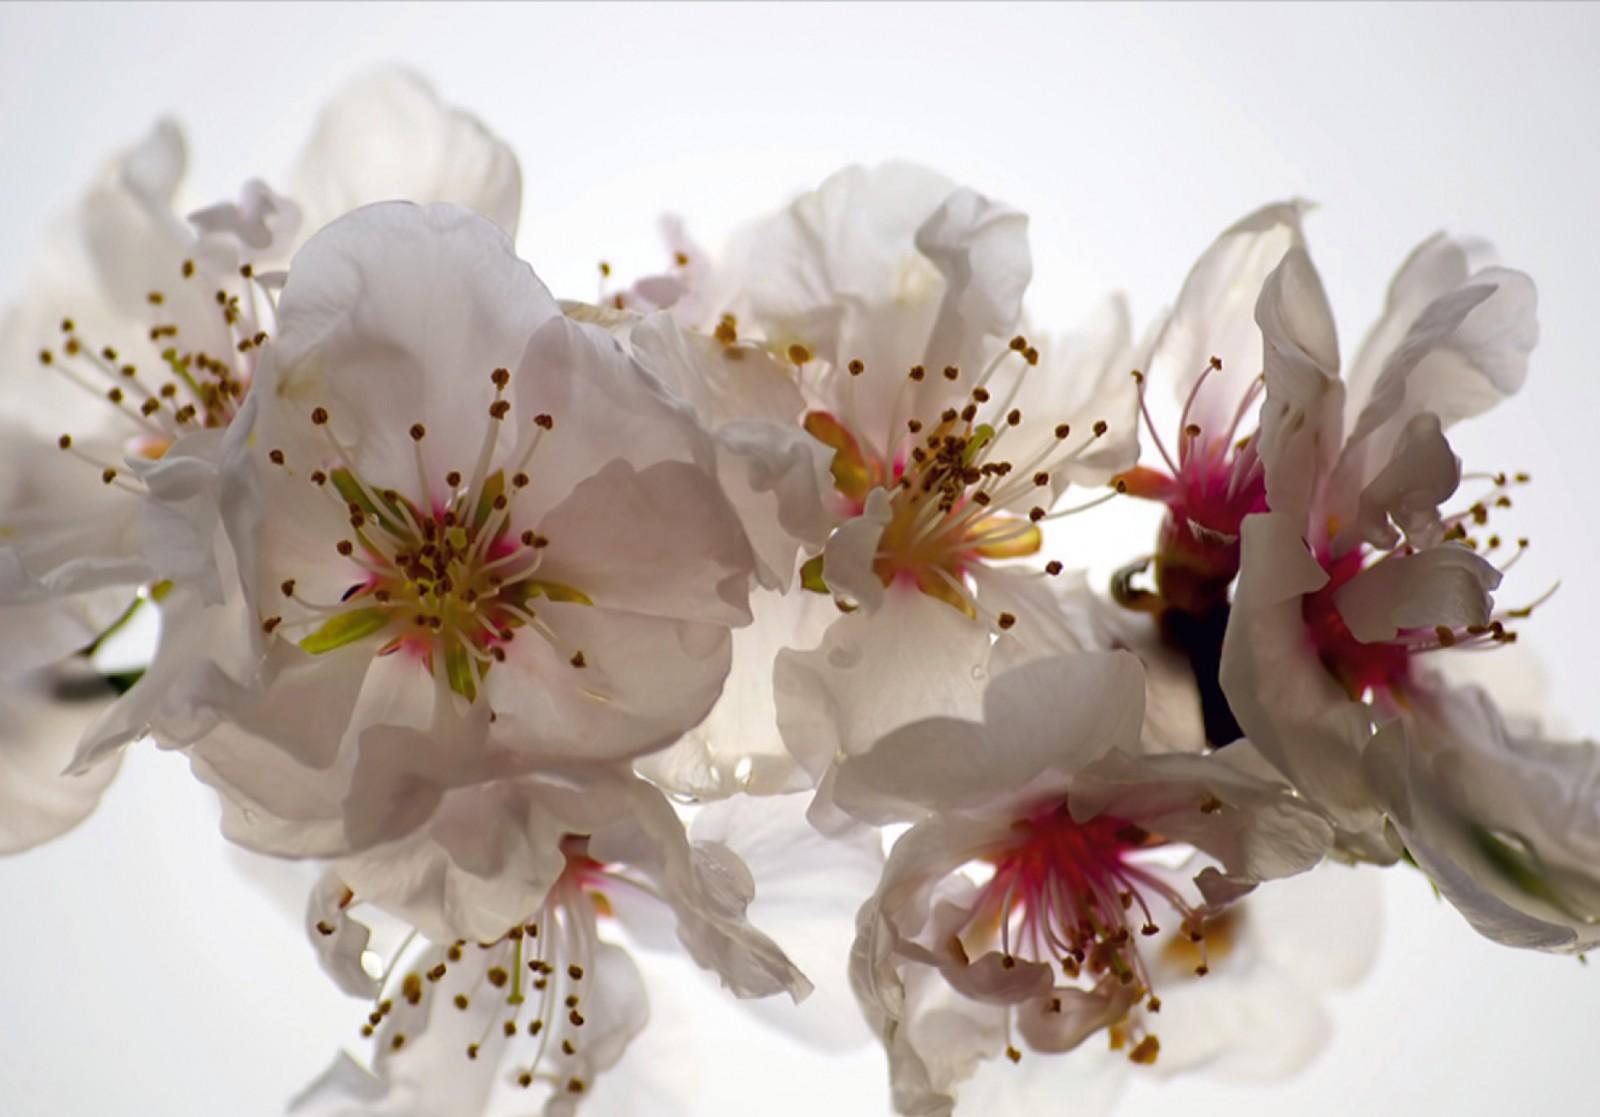 xl fototapete tapete blumen bl ten floral natur. Black Bedroom Furniture Sets. Home Design Ideas